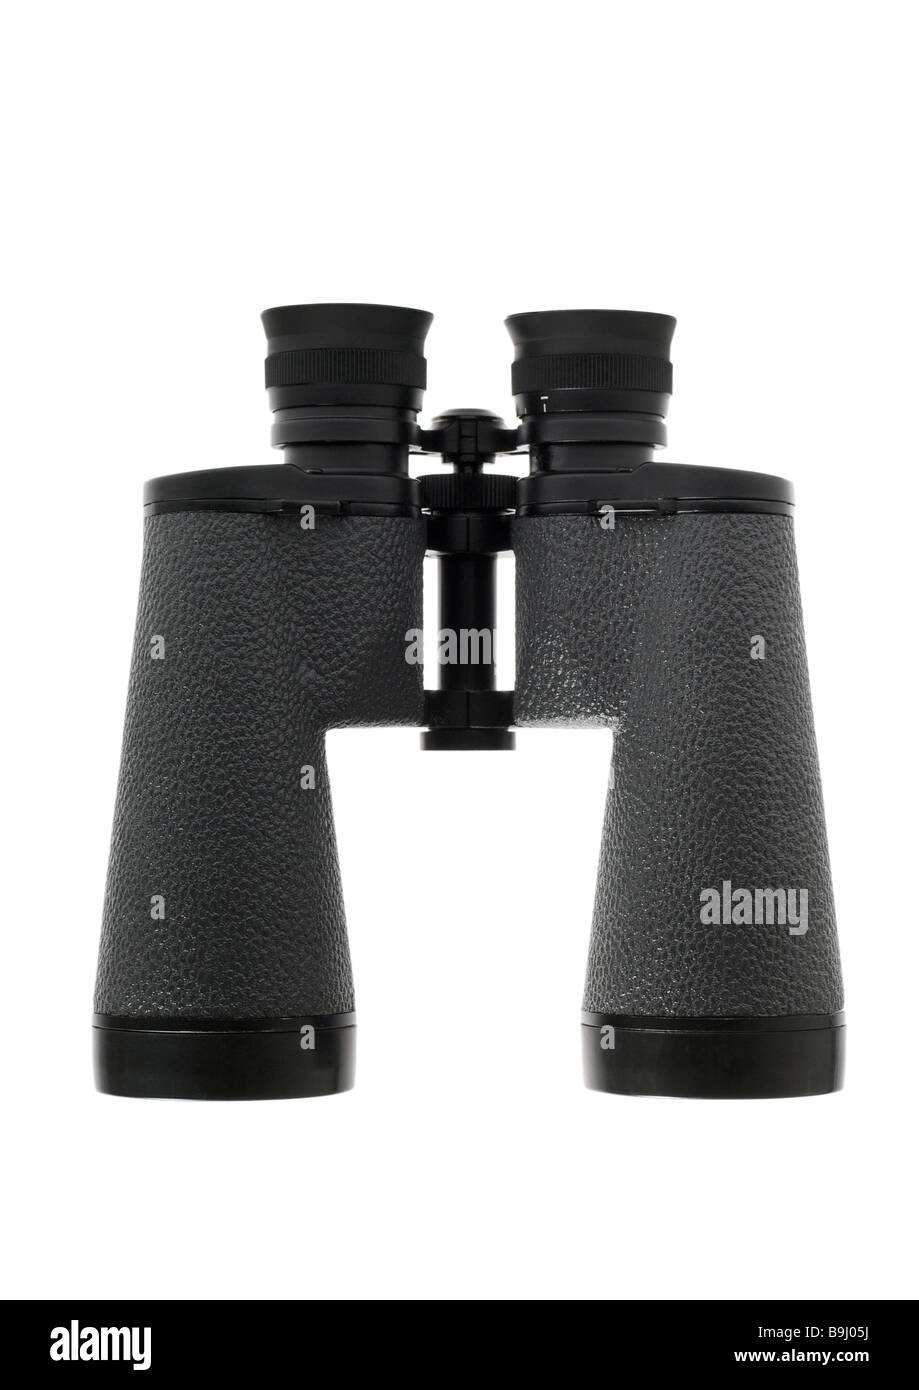 Black binoculars on white background - Stock Image